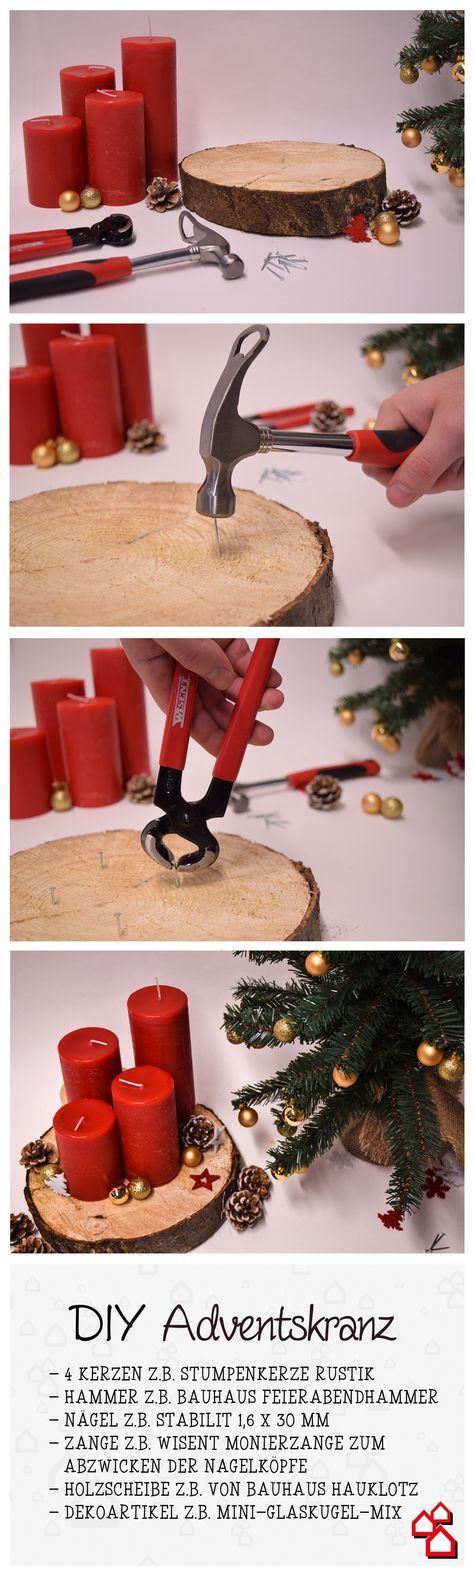 Feierabendhammer | weihnachten | Pinterest | Christmas, Christmas ...